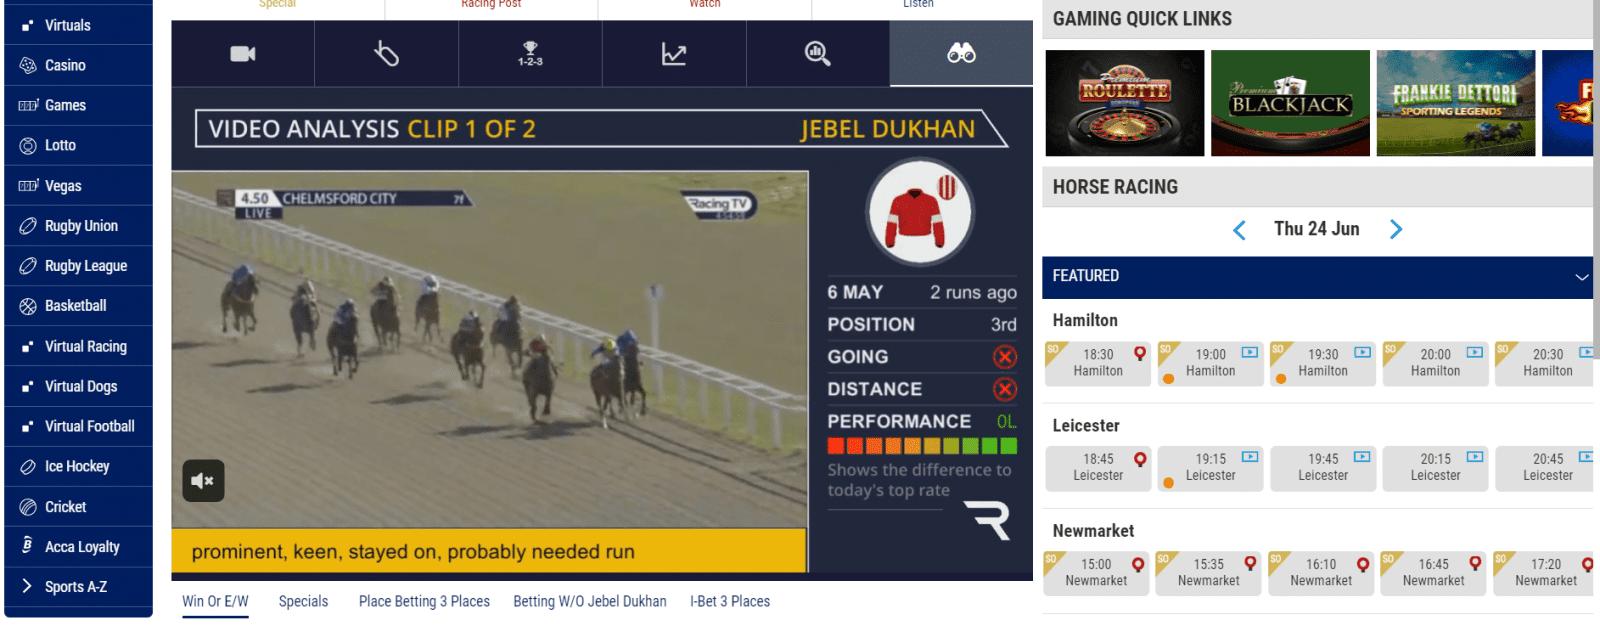 horse racing streaming - boylesports streaming